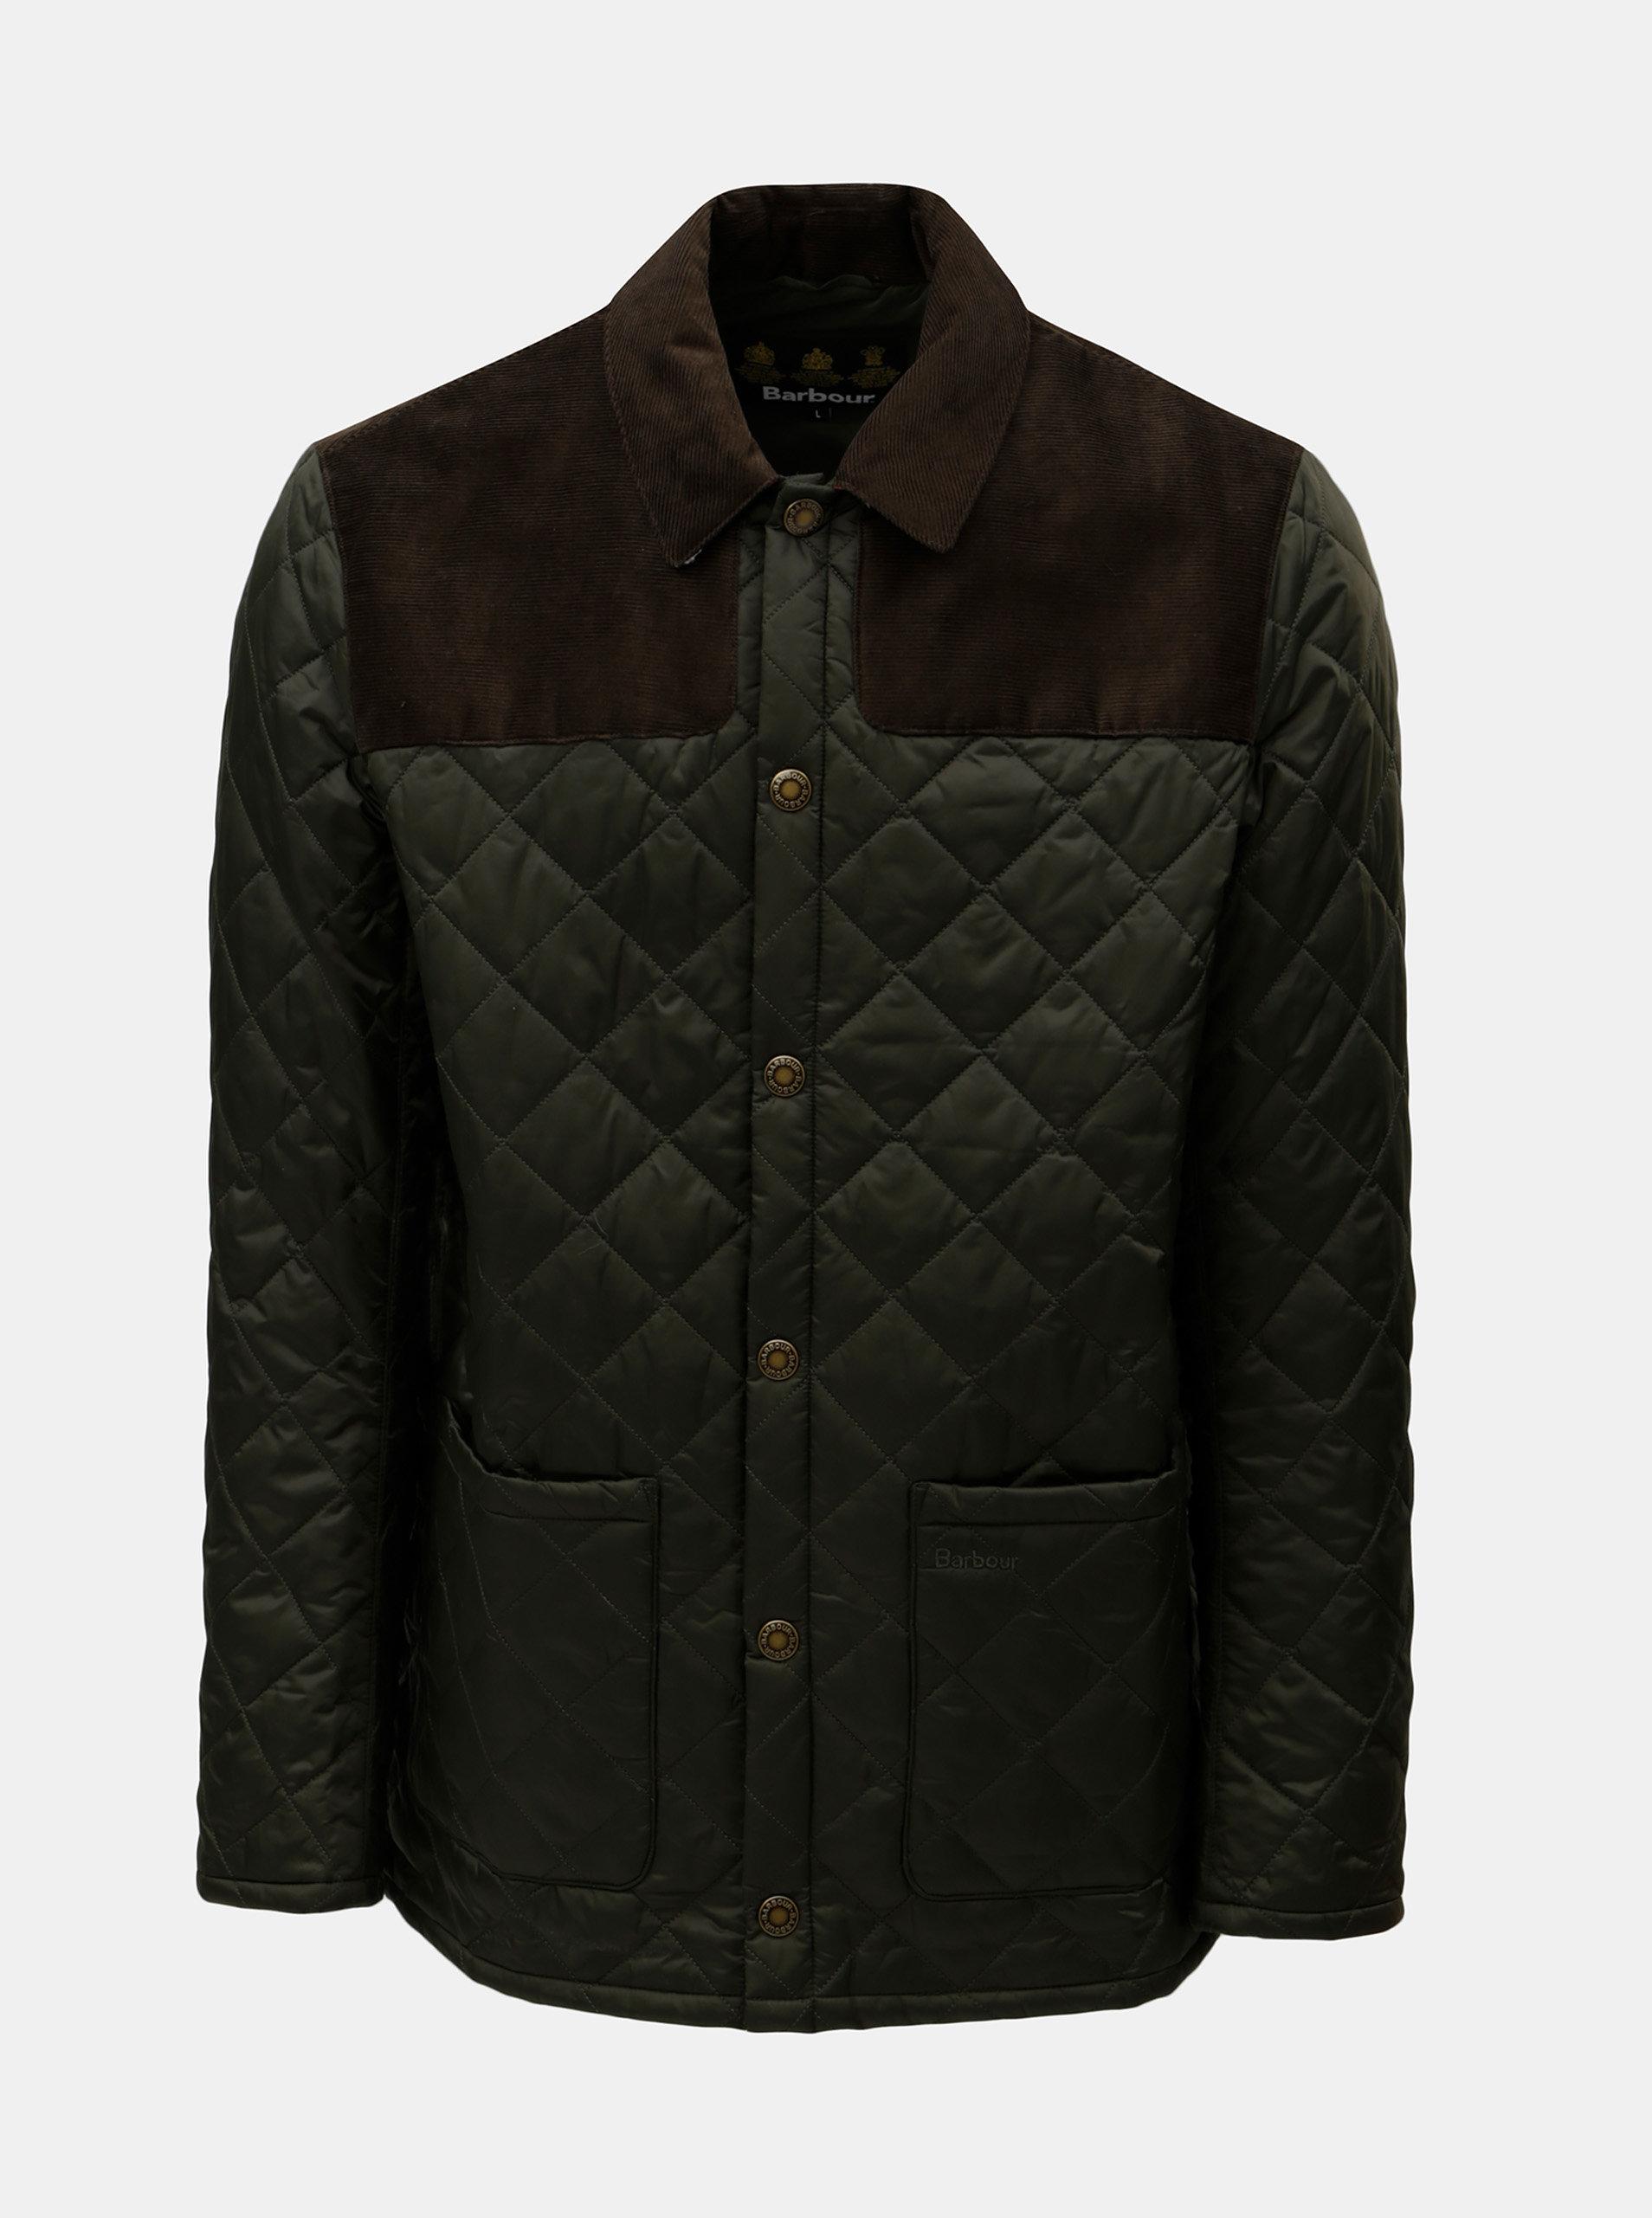 Khaki prošívaná lehká bunda s manšestrovými detaily Barbour Gillock Quilt